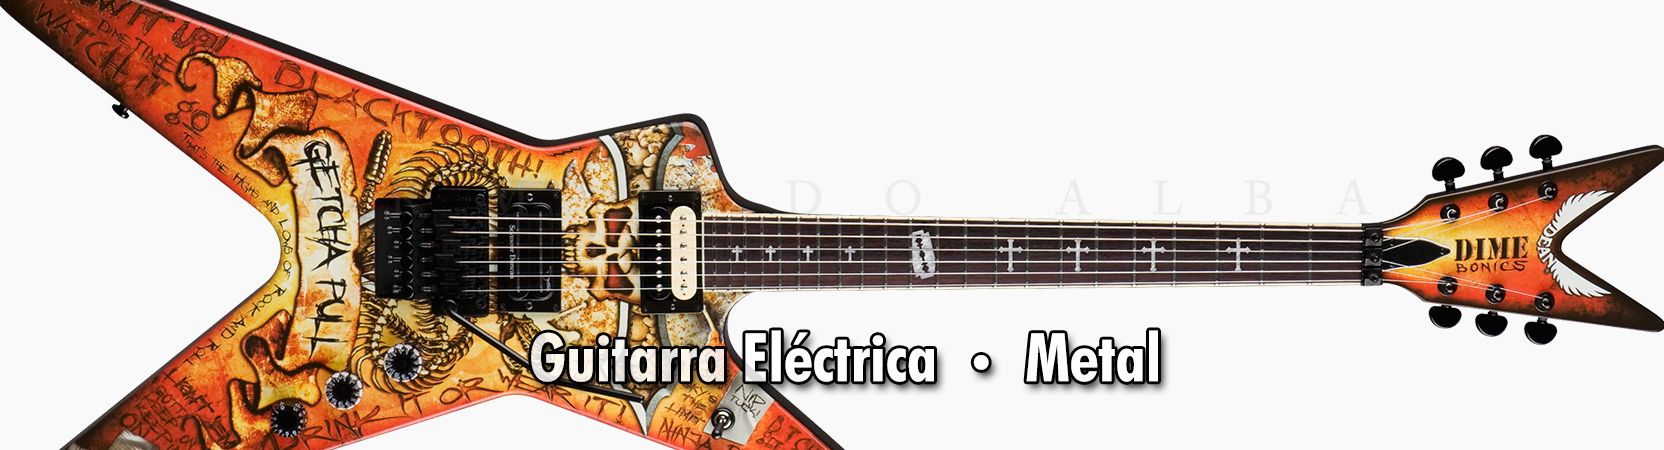 Imagen_para_página_Wix_-_guitarra_electrica_metal_01-1_(1664x450px)